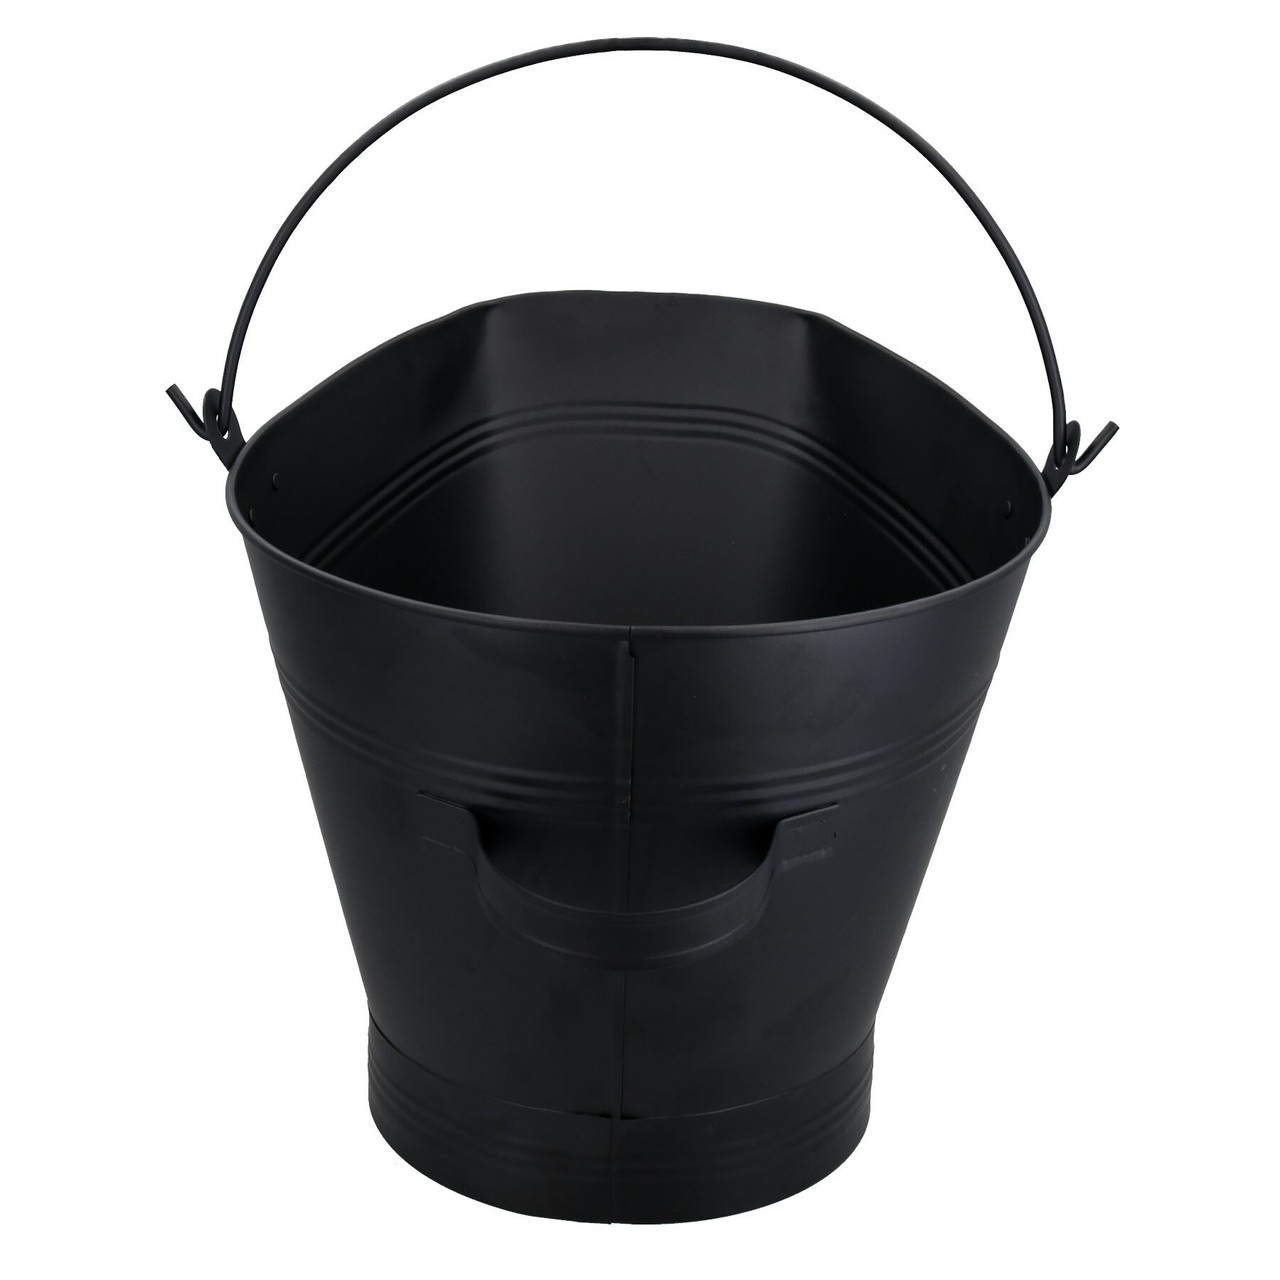 Fireplace Waterloo Style Black Coal Log Burner Scuttle Bucket Wide Mouth Fire